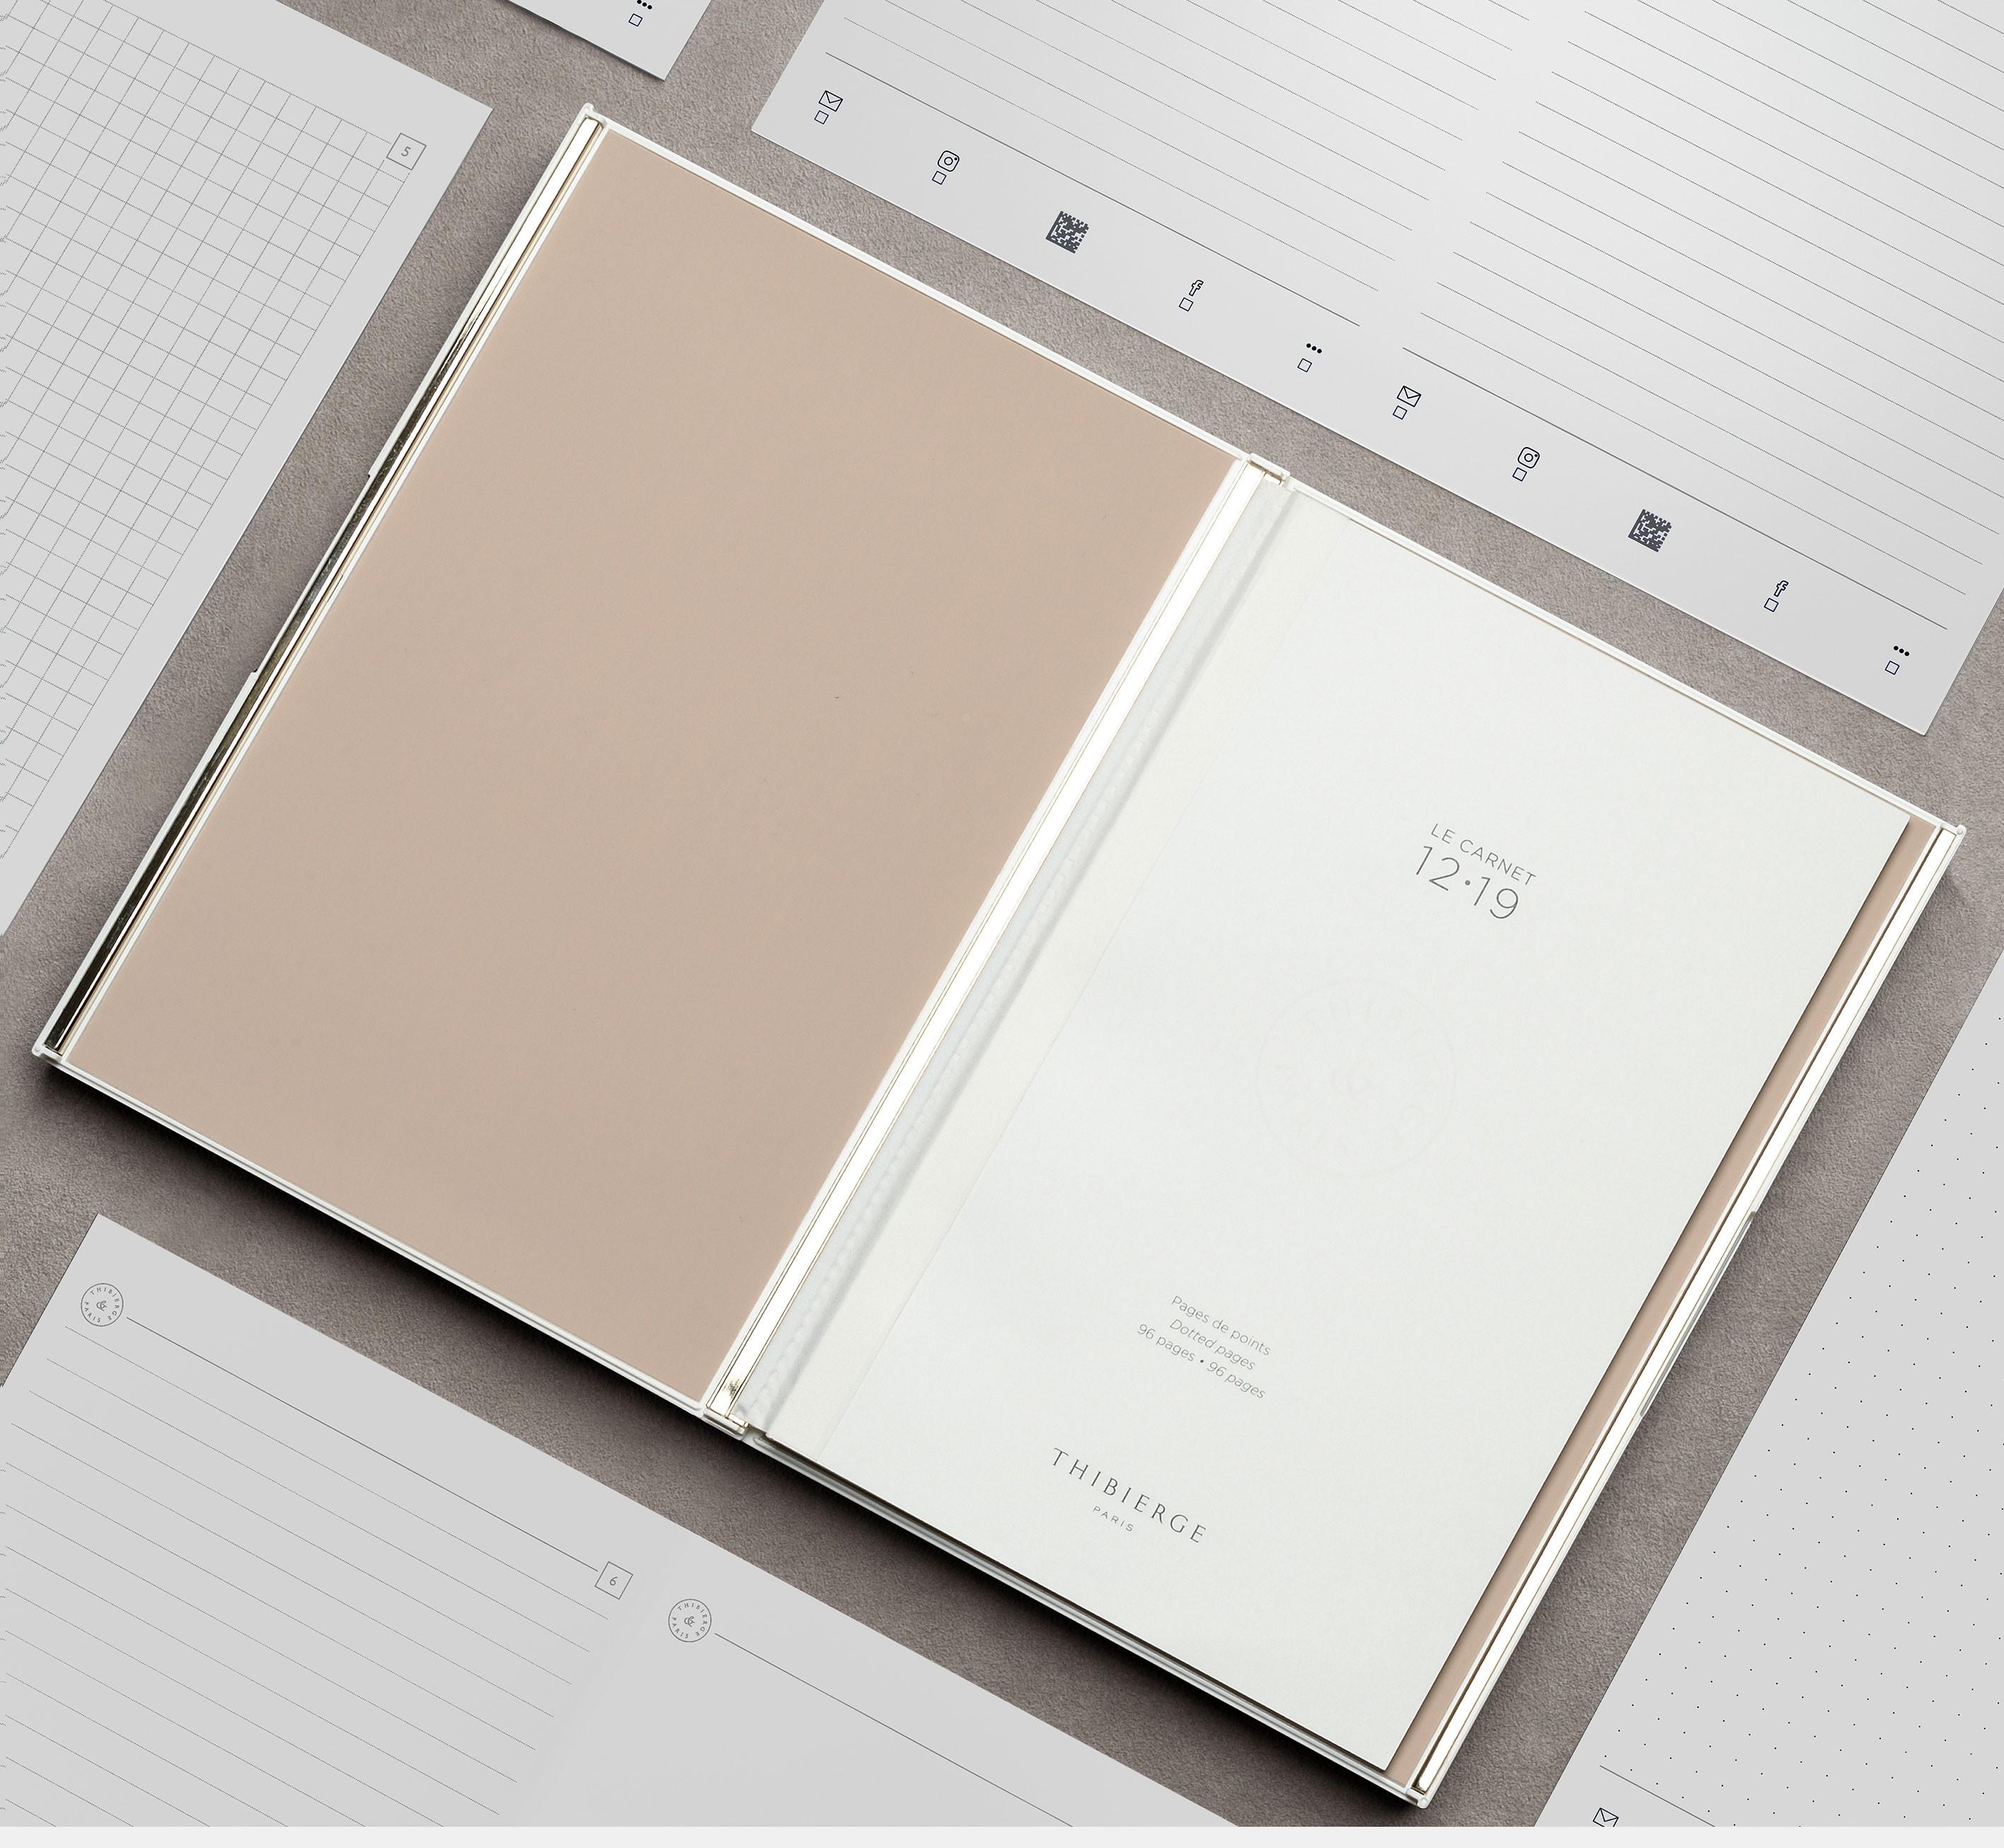 Le Carnet 12.19 White lacquered